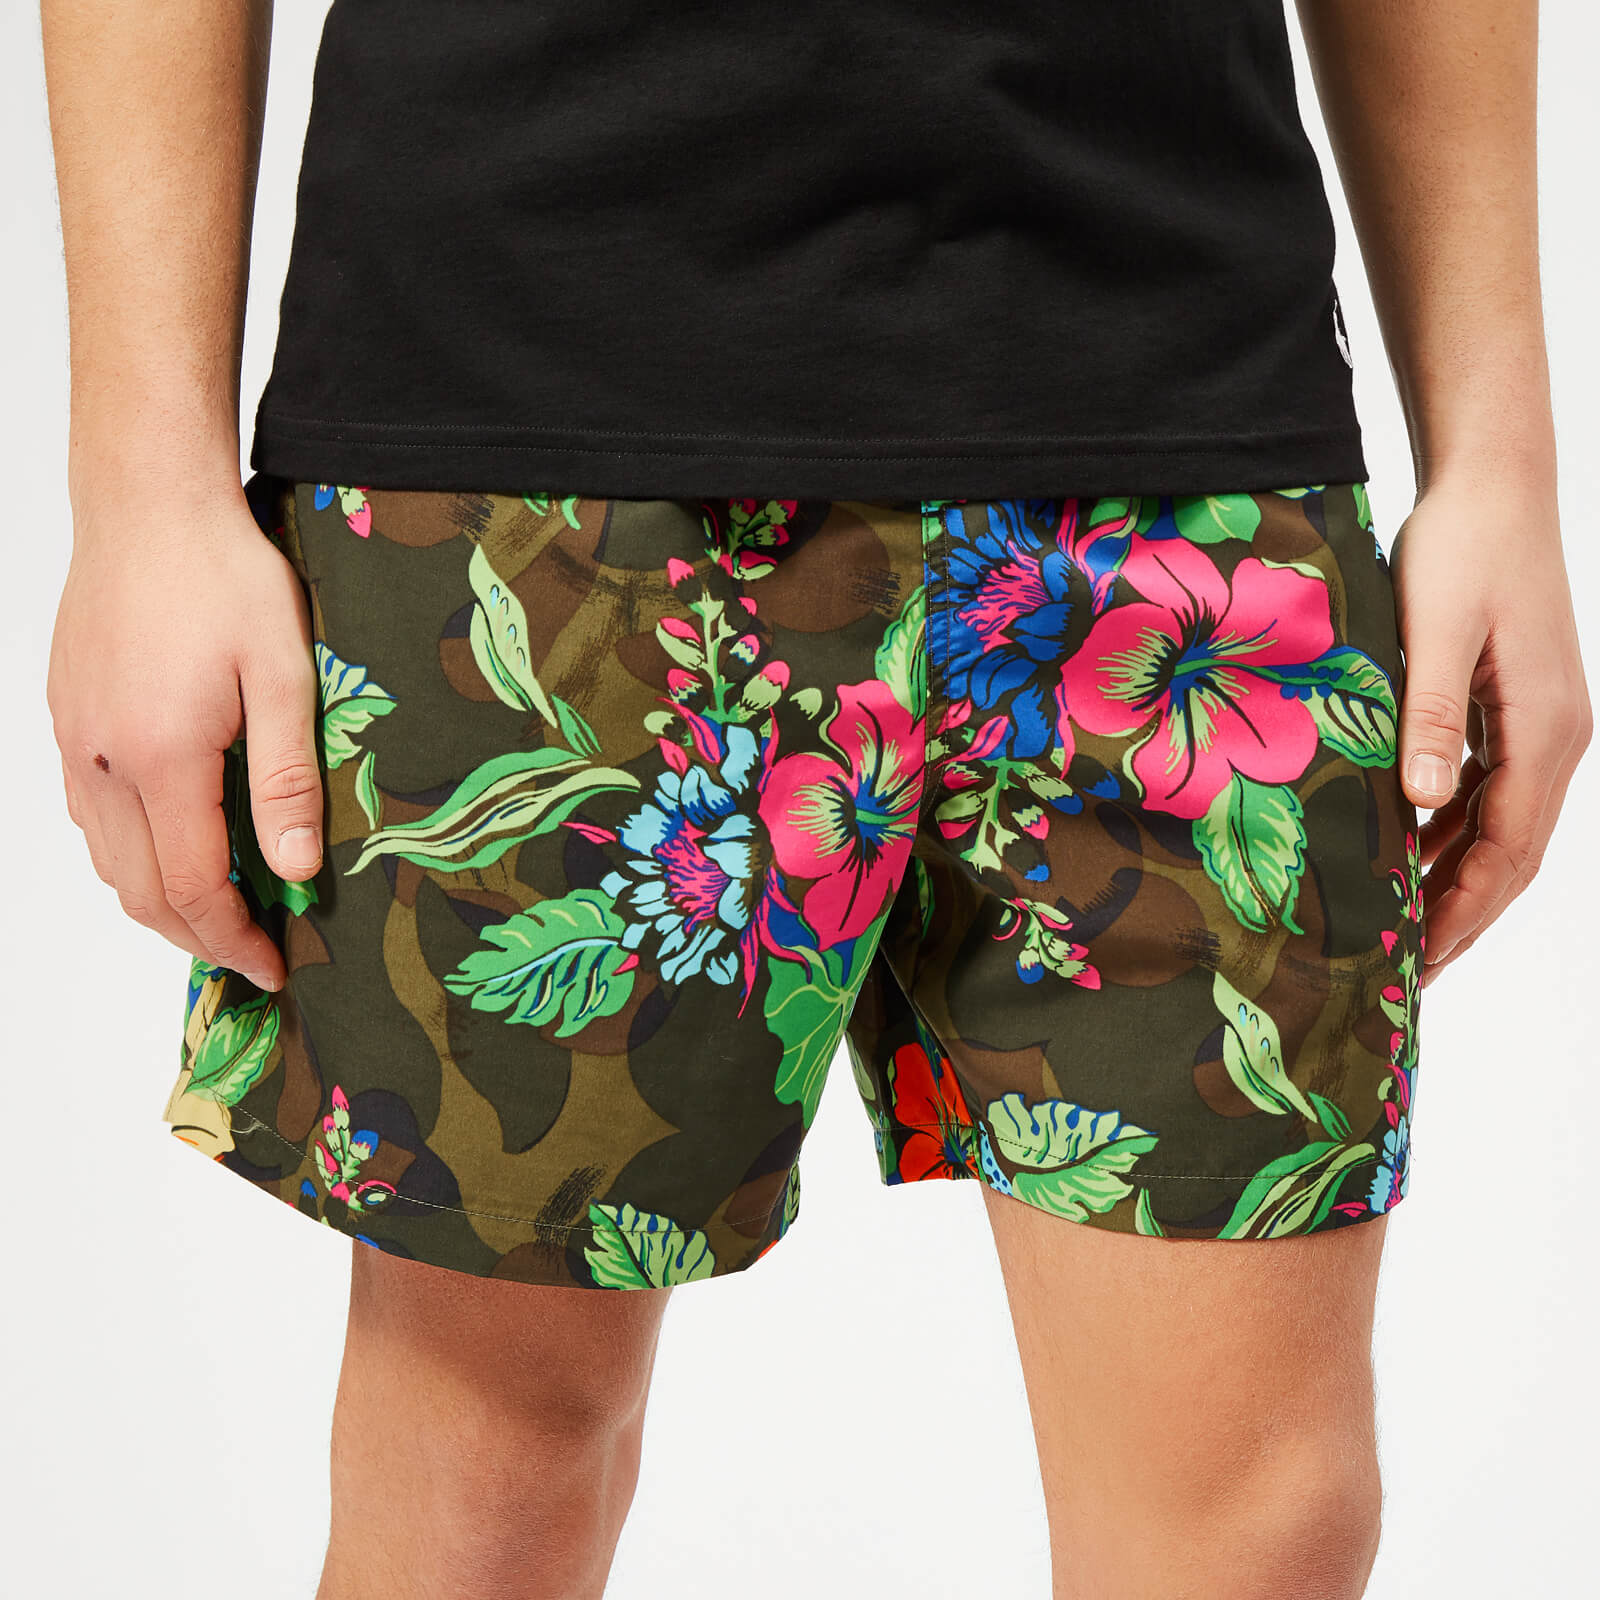 41cfde2b94 Polo Ralph Lauren Men's Traveler Swim Shorts - Tropical On Camo - Free UK  Delivery over £50